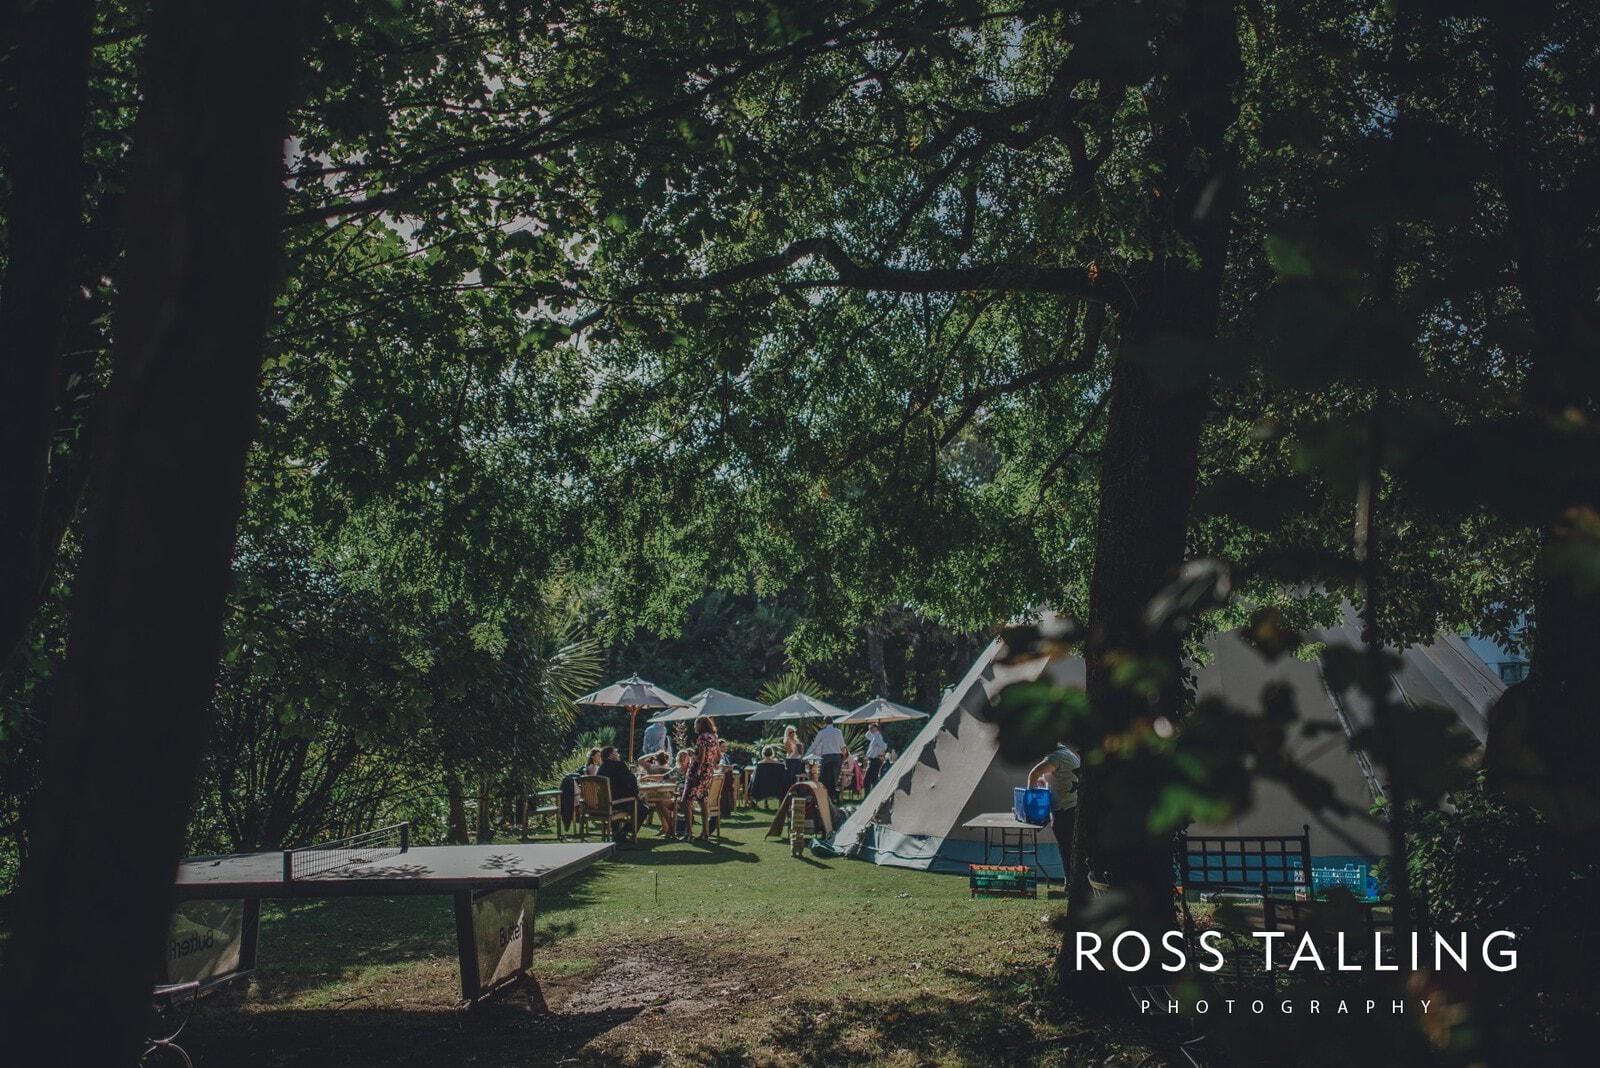 laura-matts-rosevine-hotel-wedding-photography-cornwall_0129